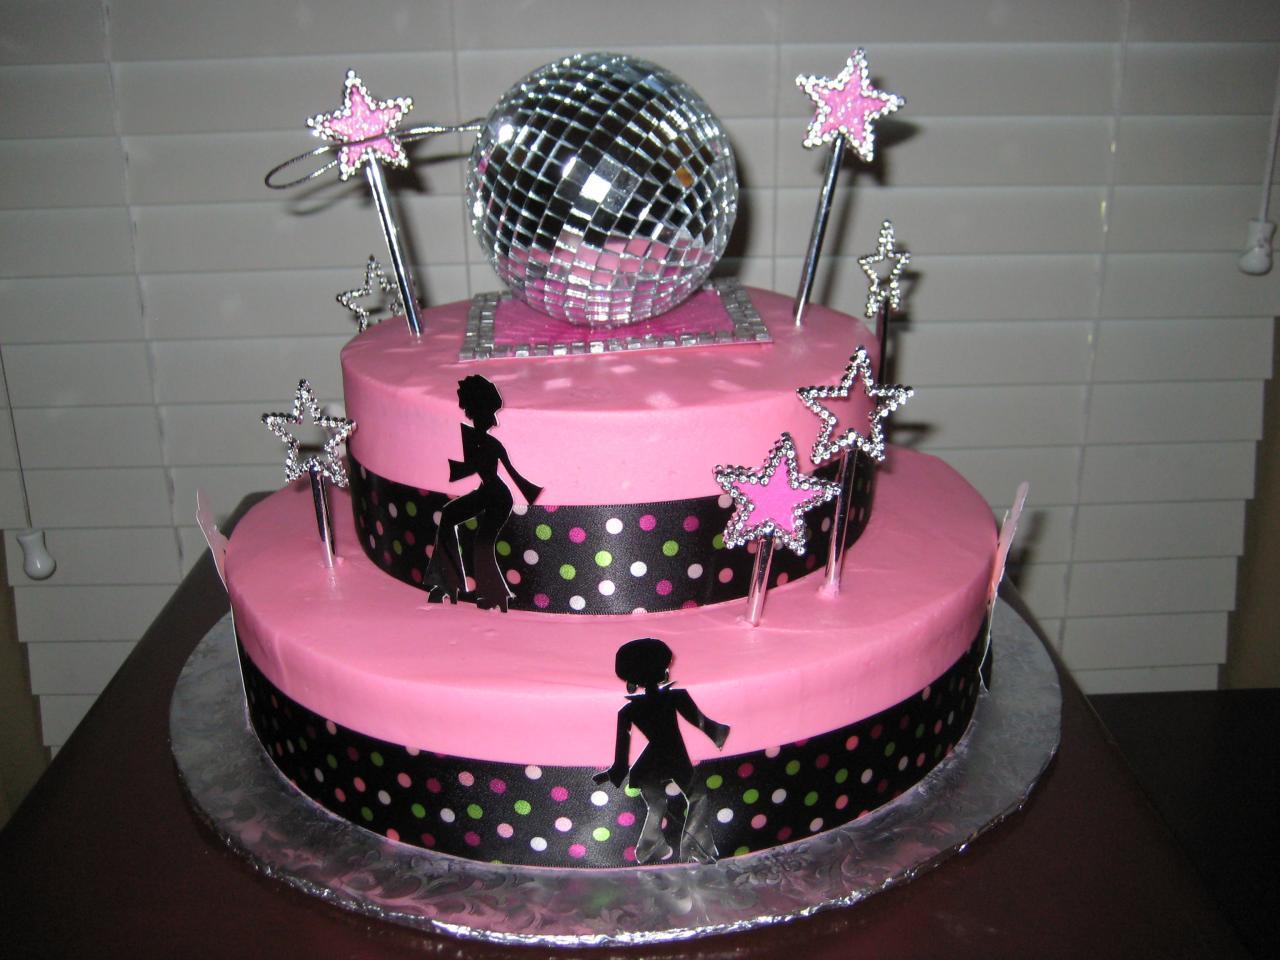 Disco_Cake_7905525_large